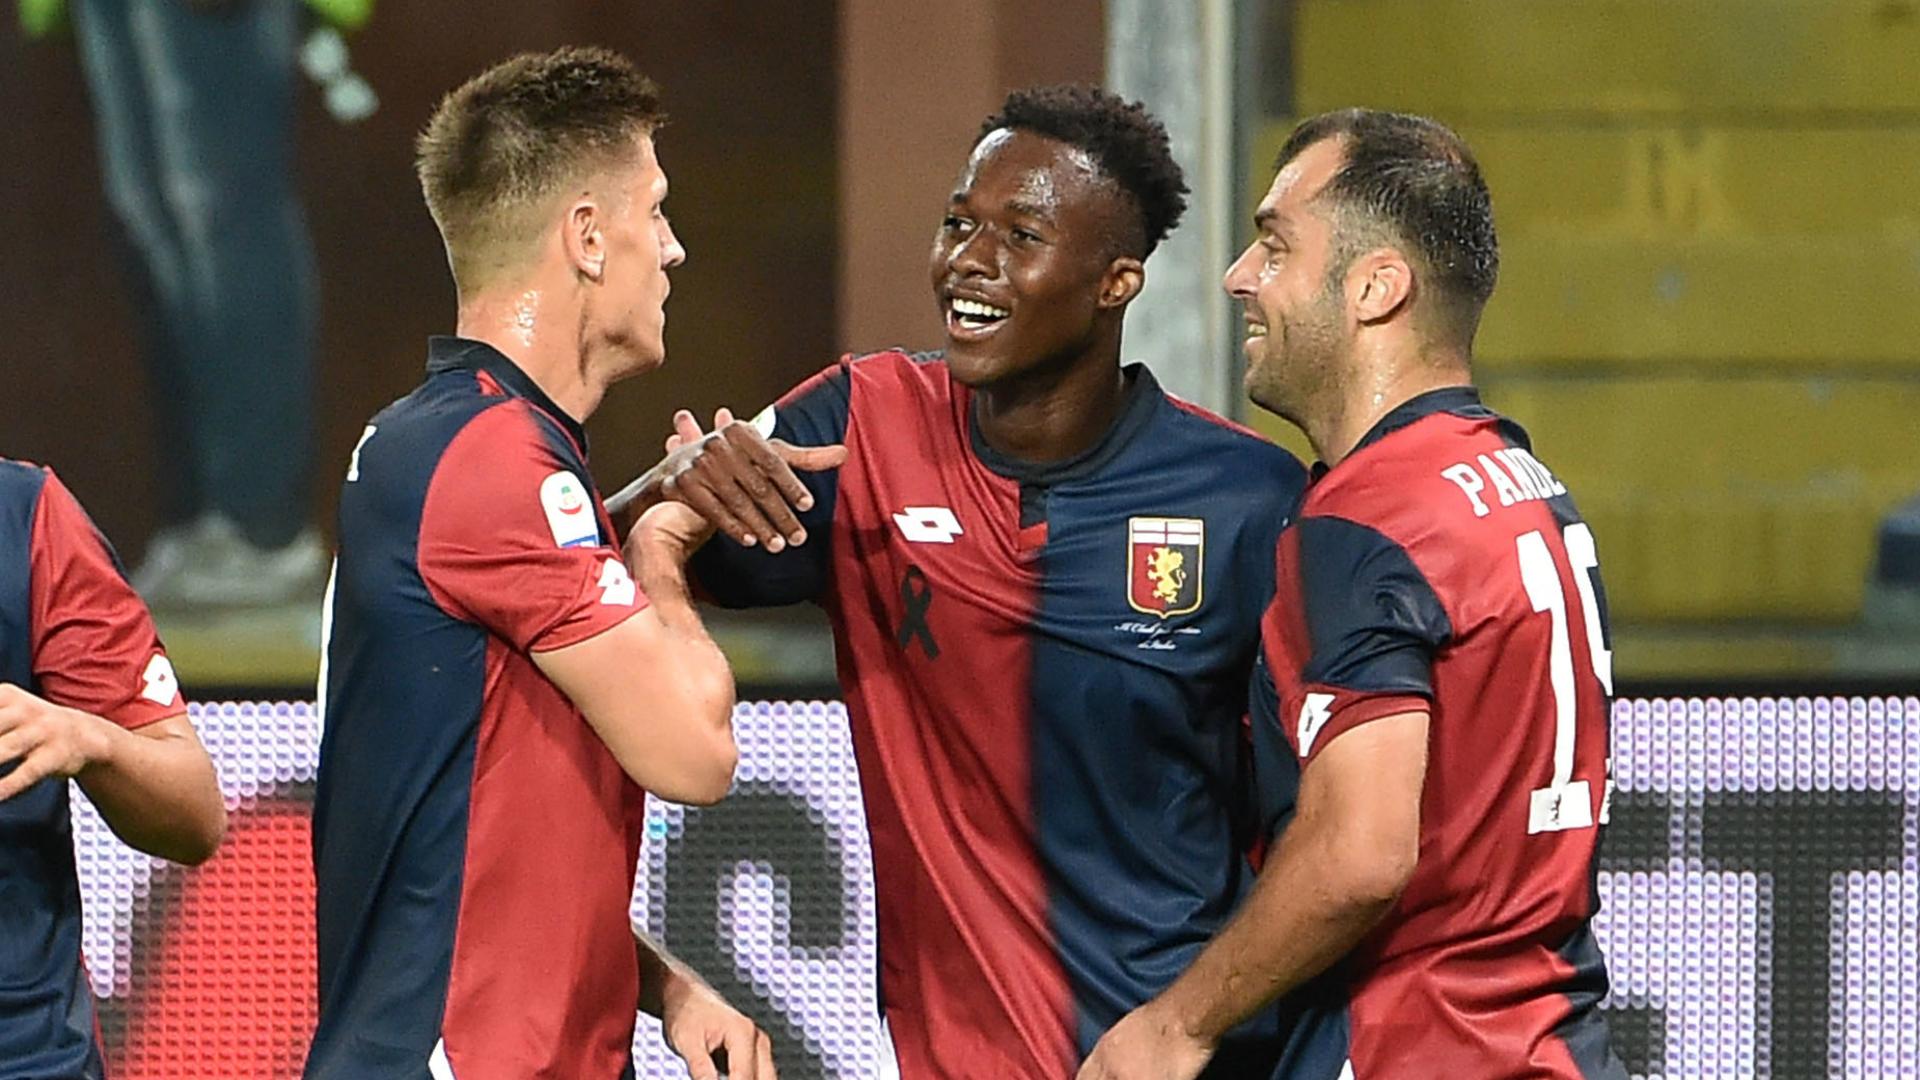 U23 Afcon: Genoa's Kouame and Celtic's Bayo top Ivory Coast squad